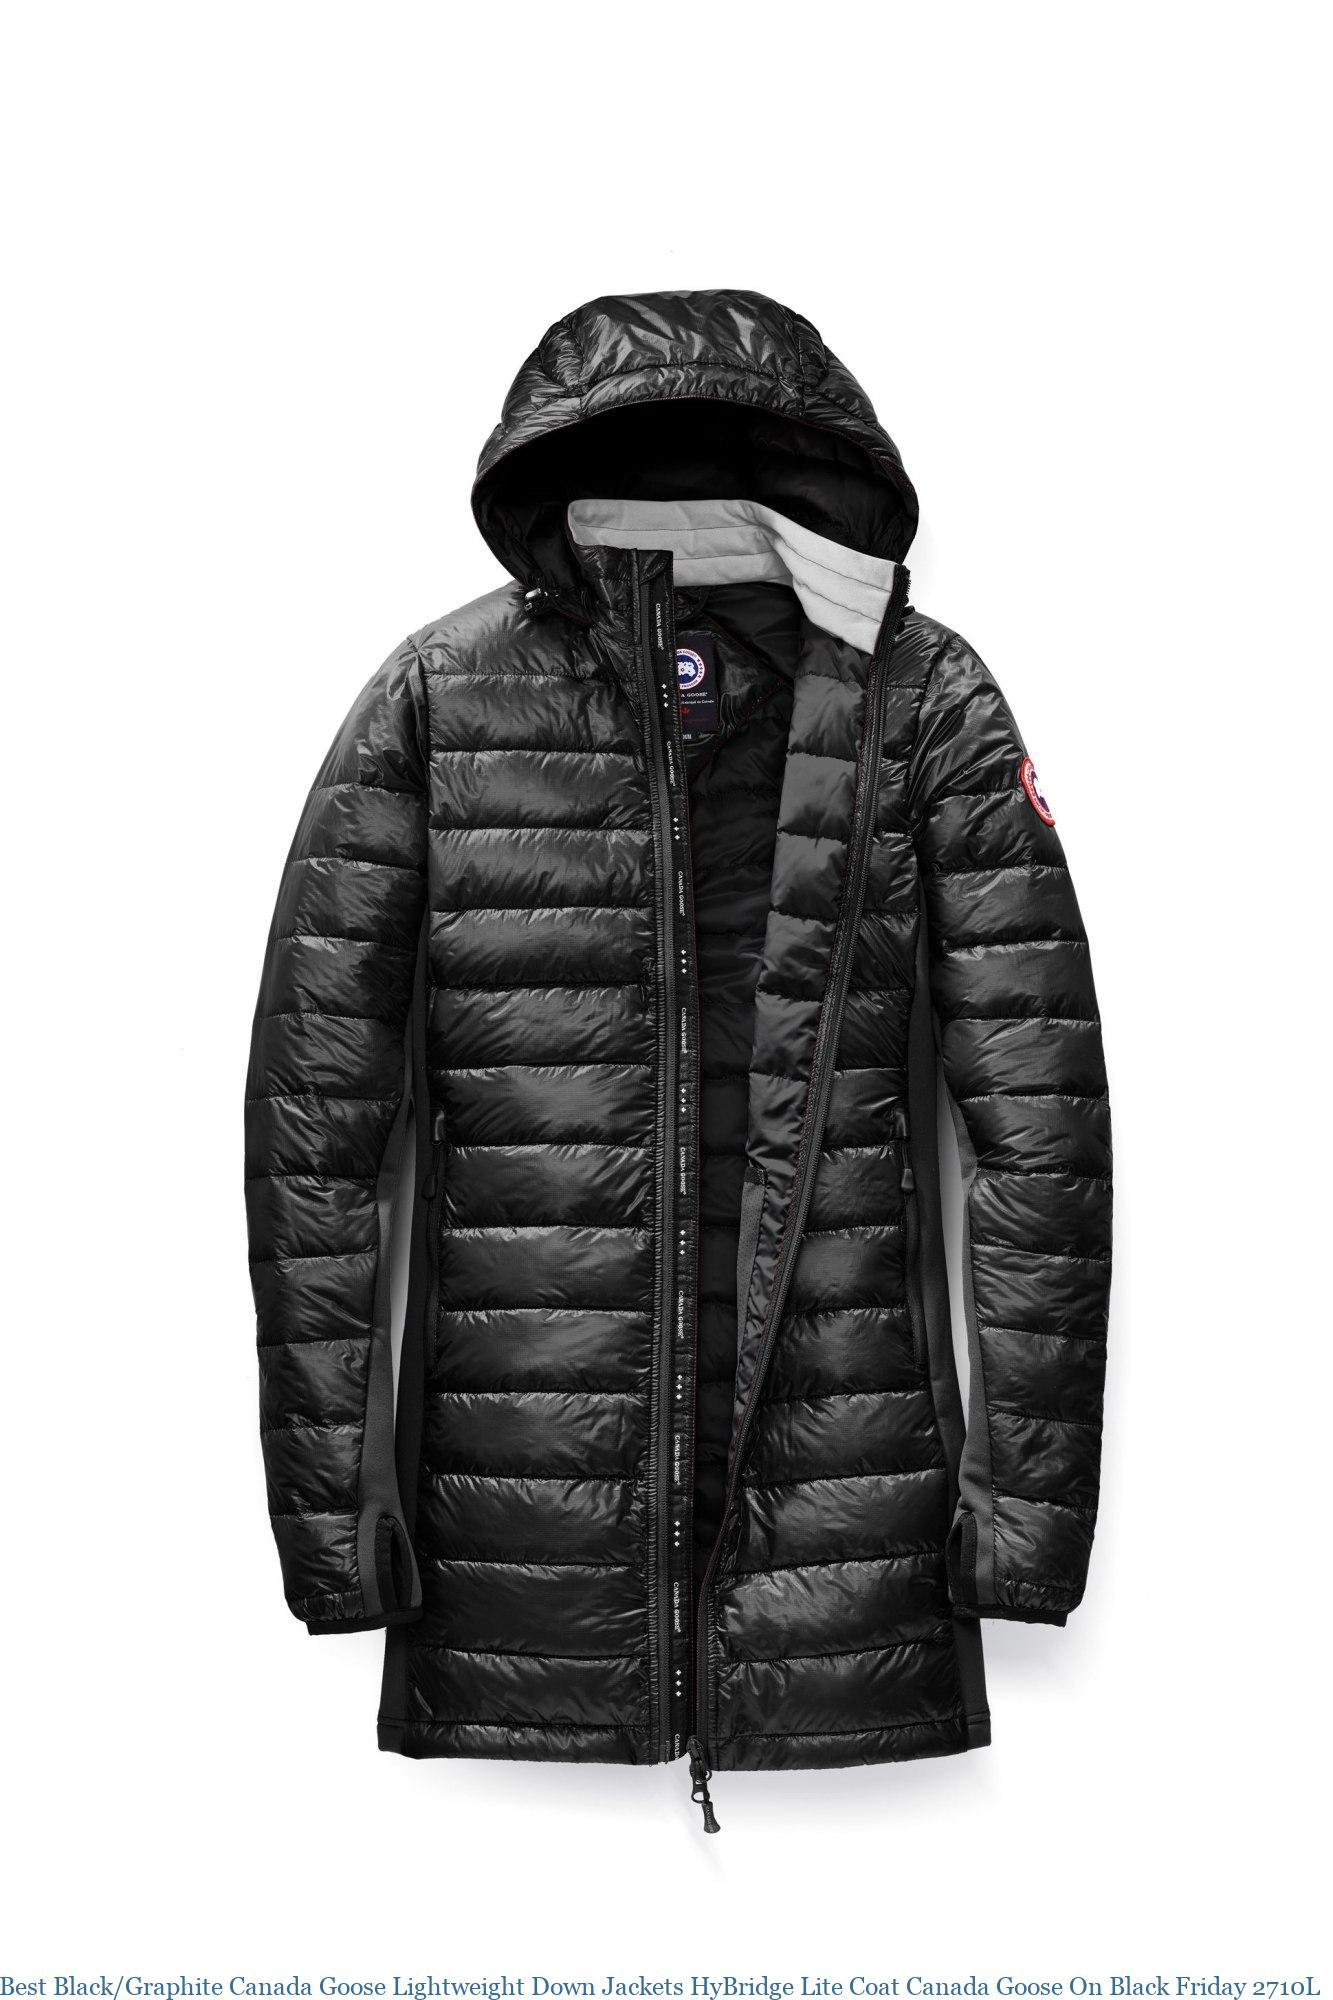 e54c889ca Best Black/Graphite Canada Goose Lightweight Down Jackets HyBridge Lite  Coat Canada Goose On Black Friday 2710L